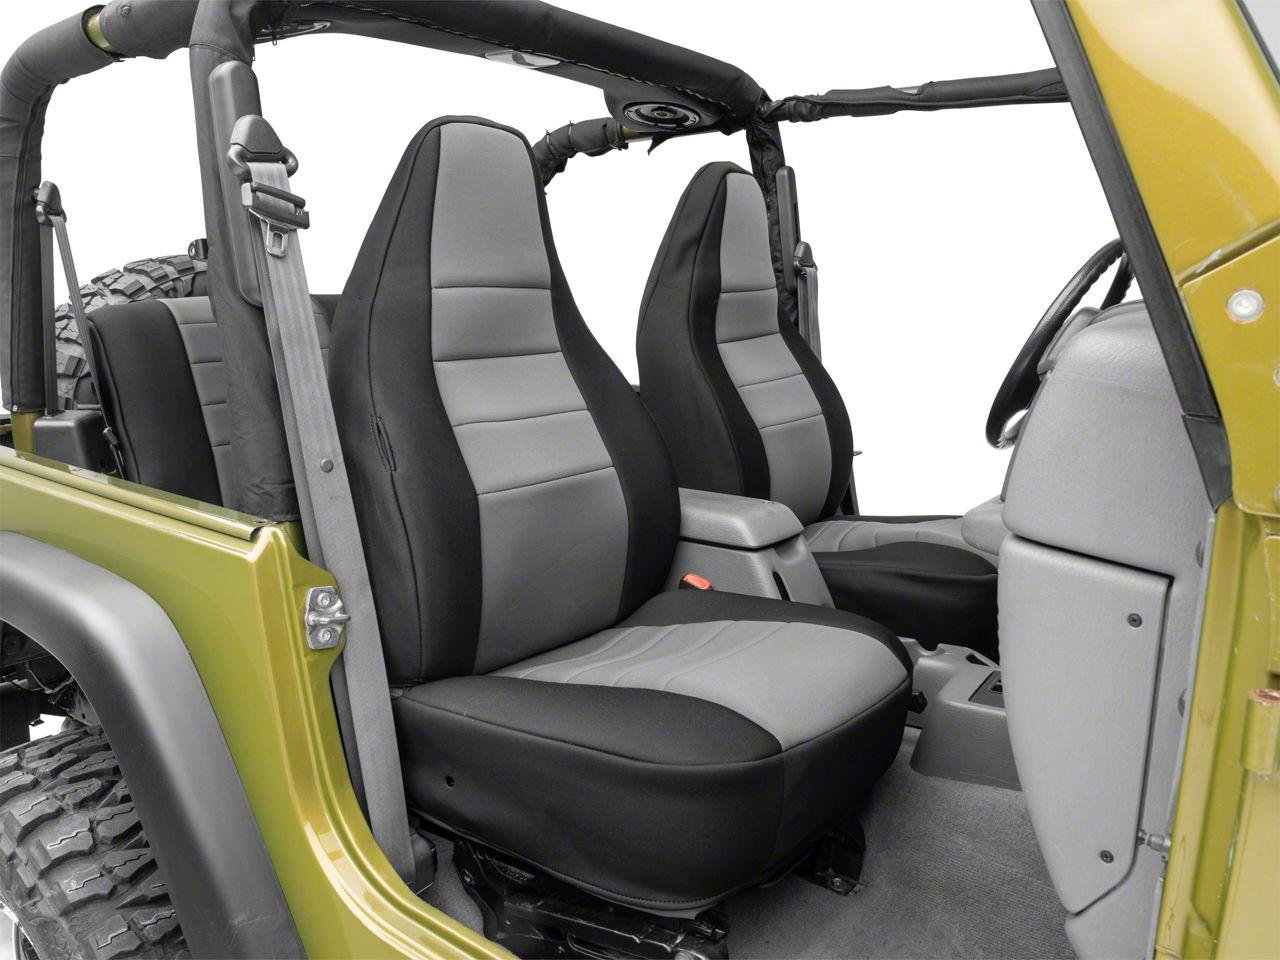 2 Pack 2 Door 2007-2010 Jeep Wrangler JK Rugged Ridge 13294.01 Black Seat Cover Kit